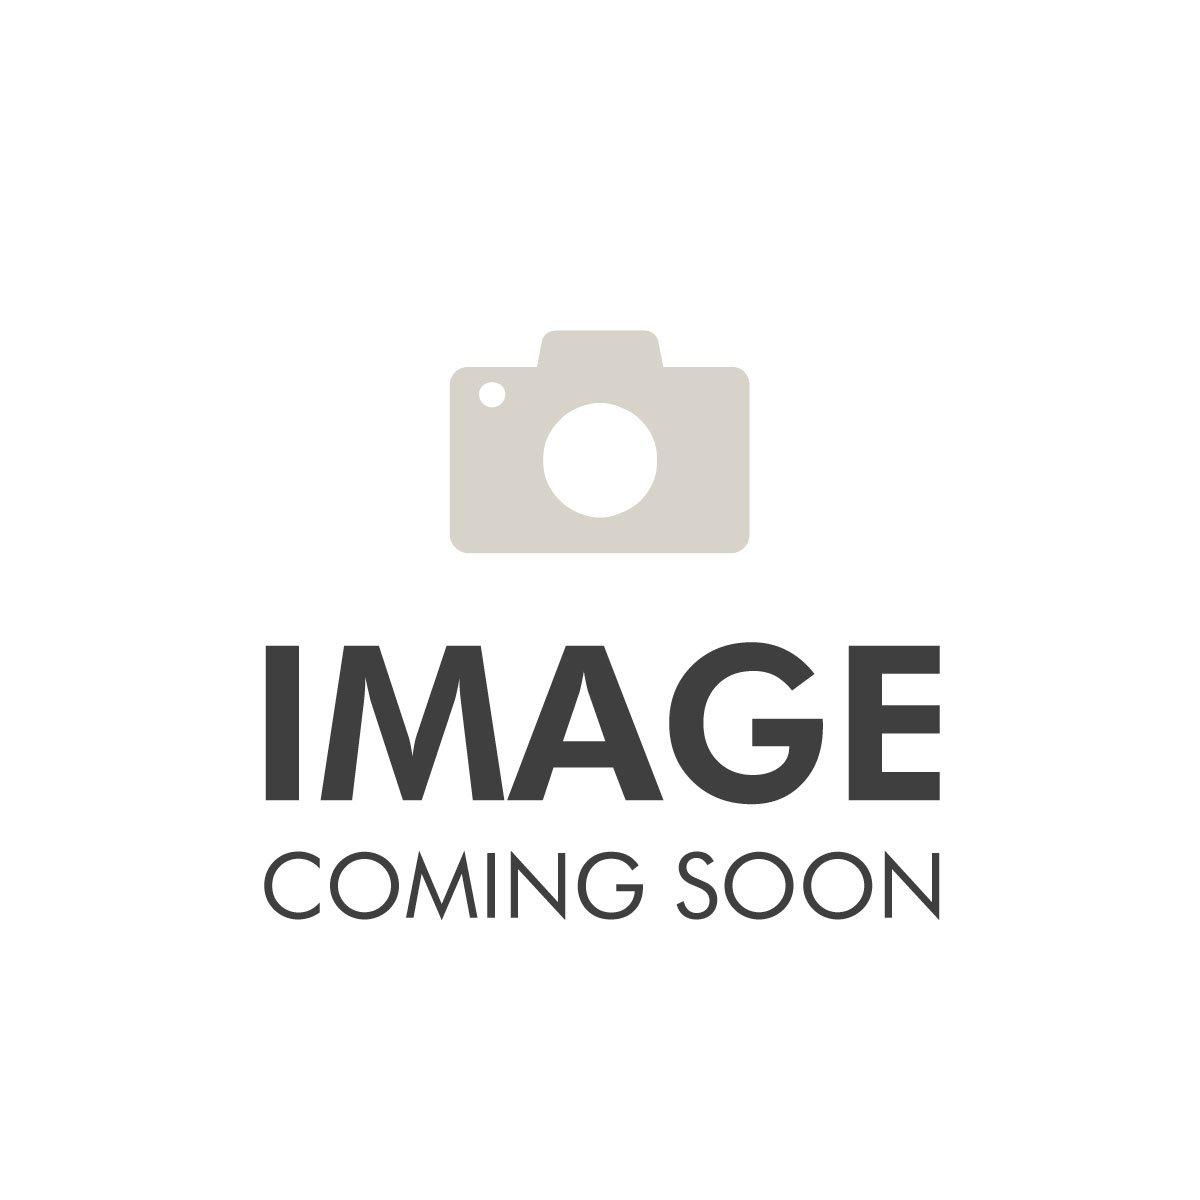 L'Oreal L'Oréal Paris Revitalift Eye Cream 15ml